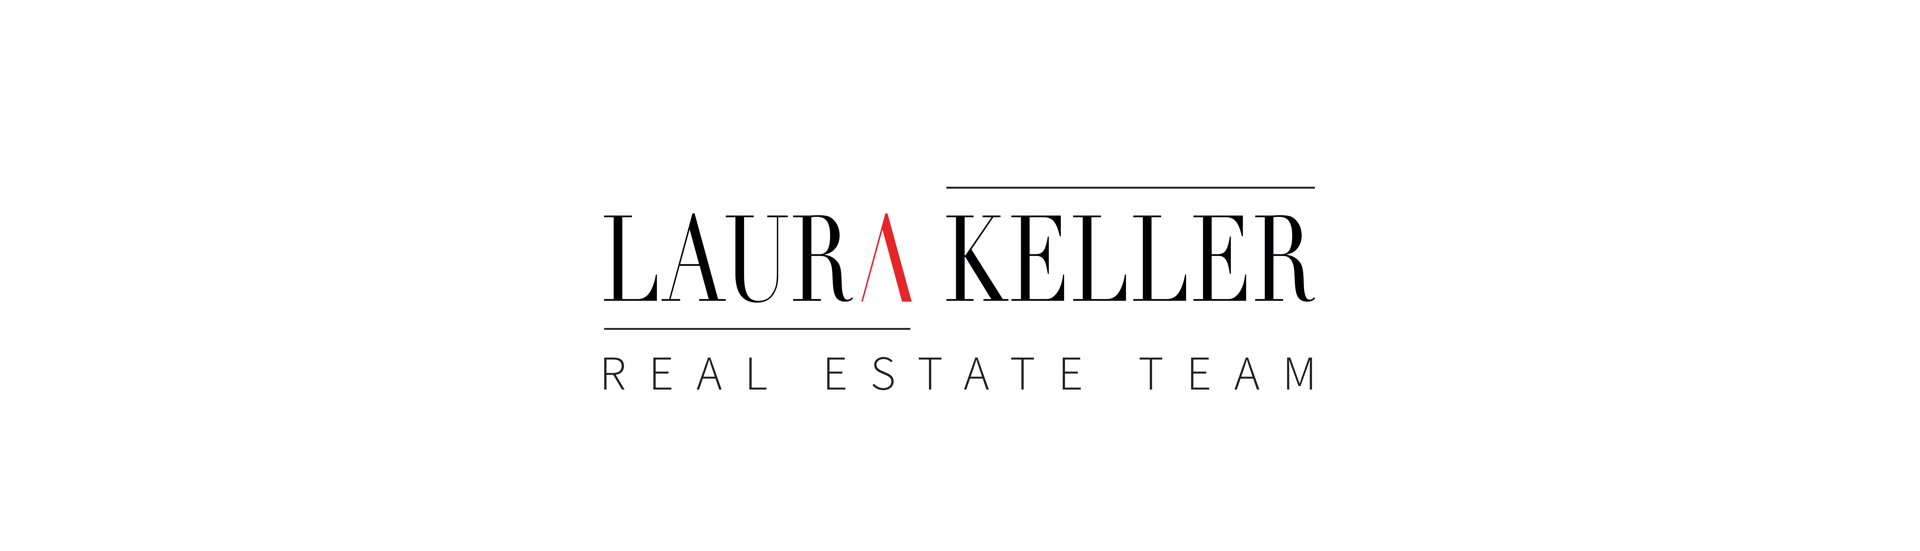 Laura Keller Real Estate Team (Ottawa)